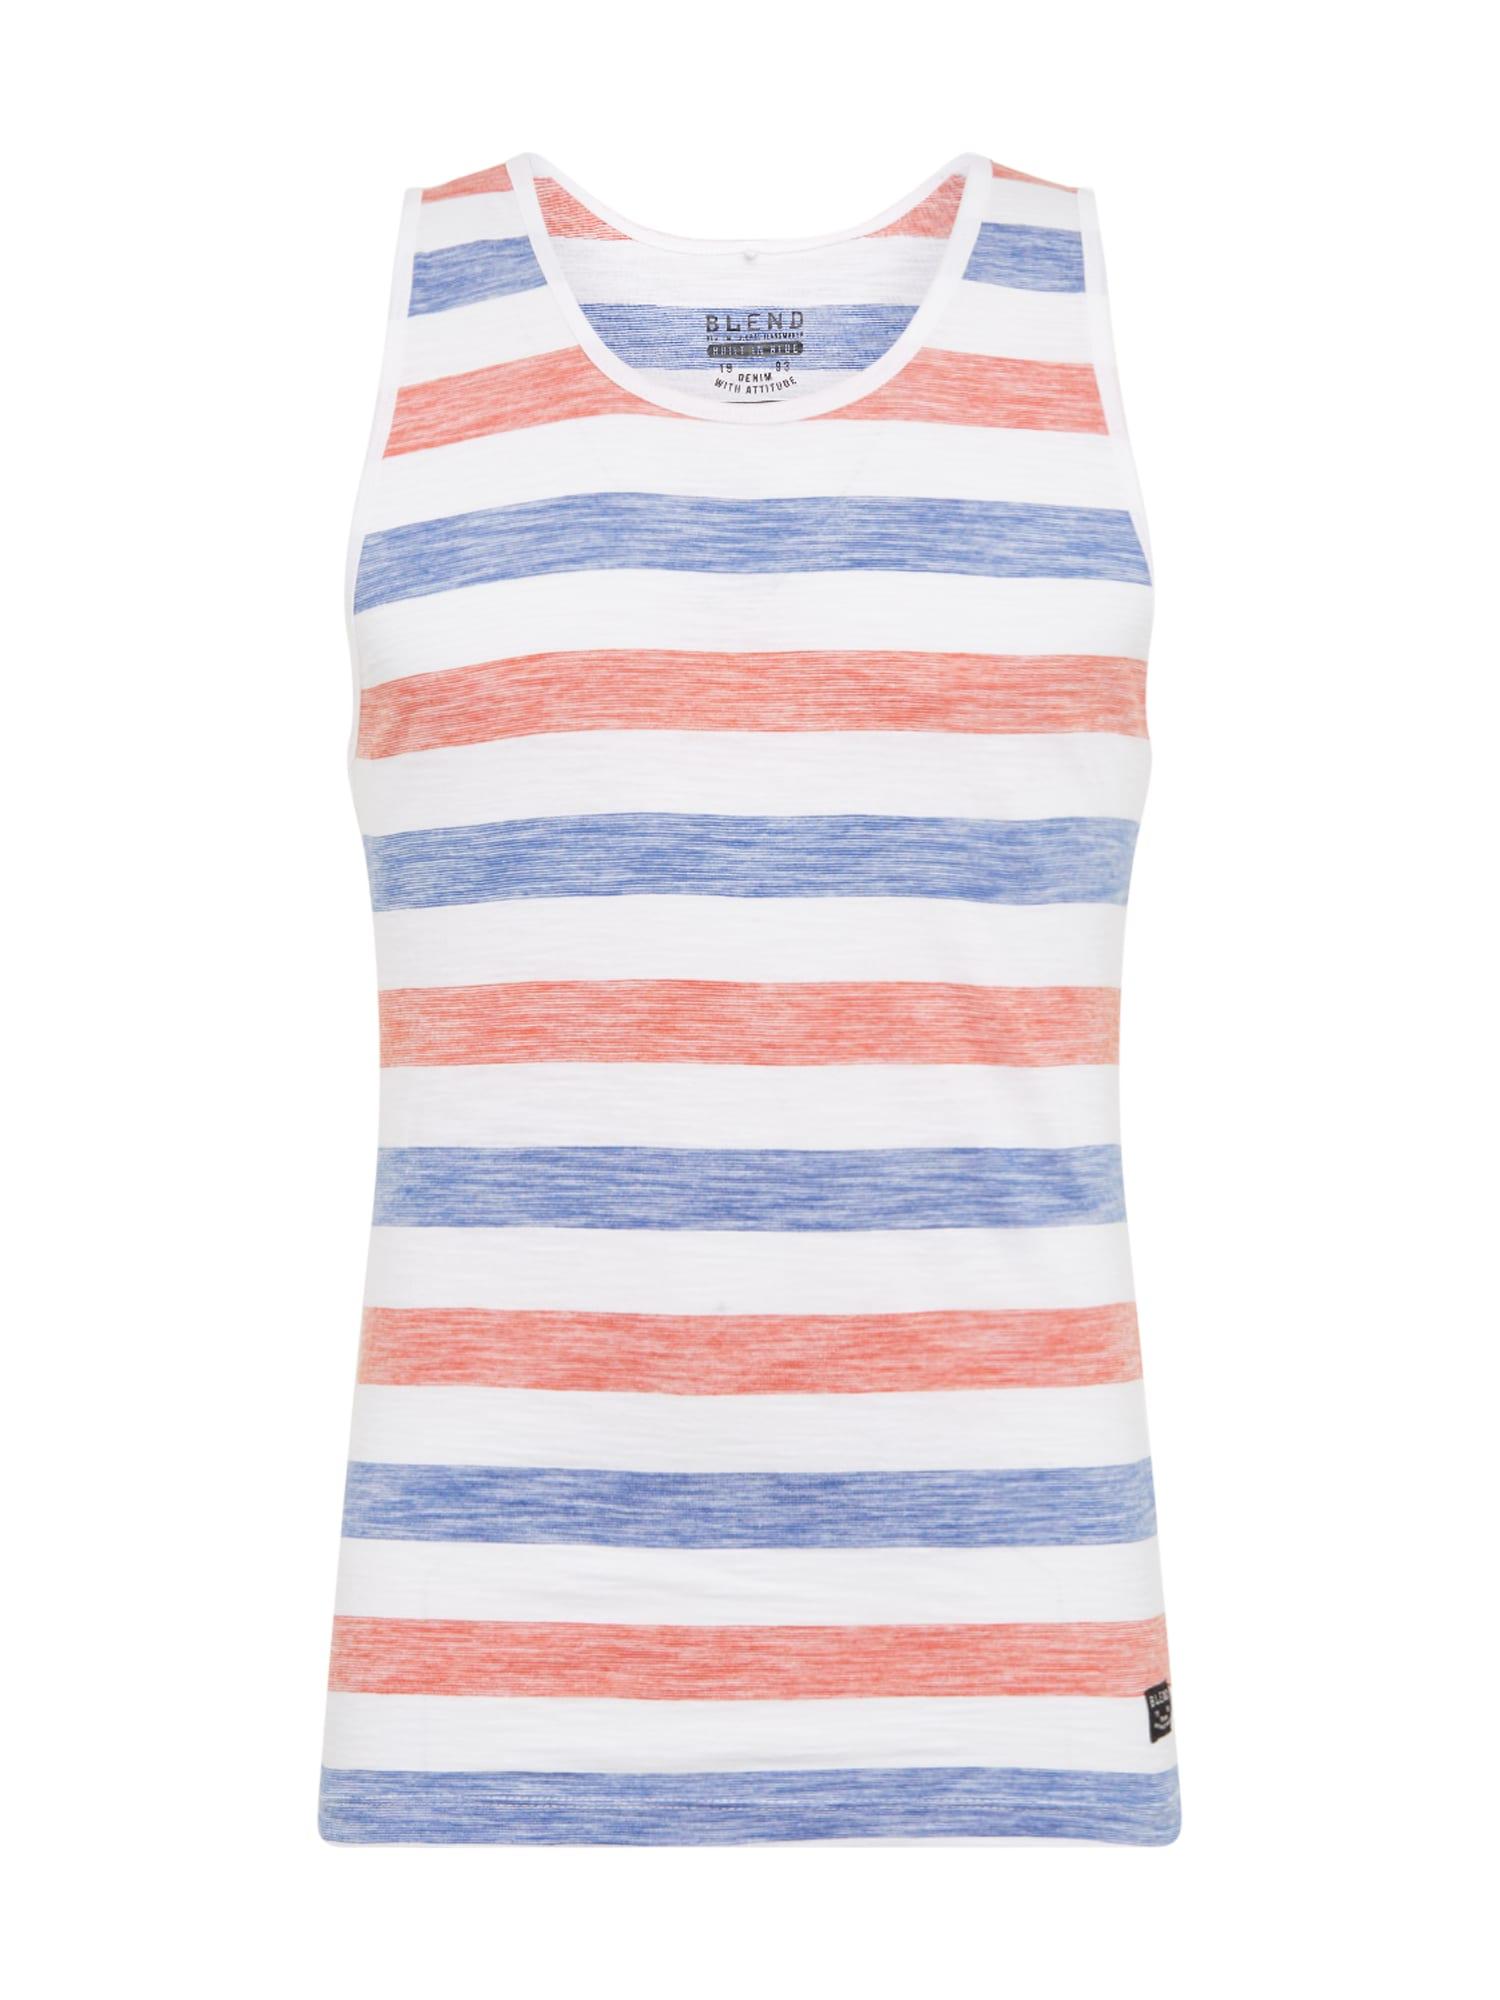 BLEND Marškinėliai mėlyna / raudona / balta